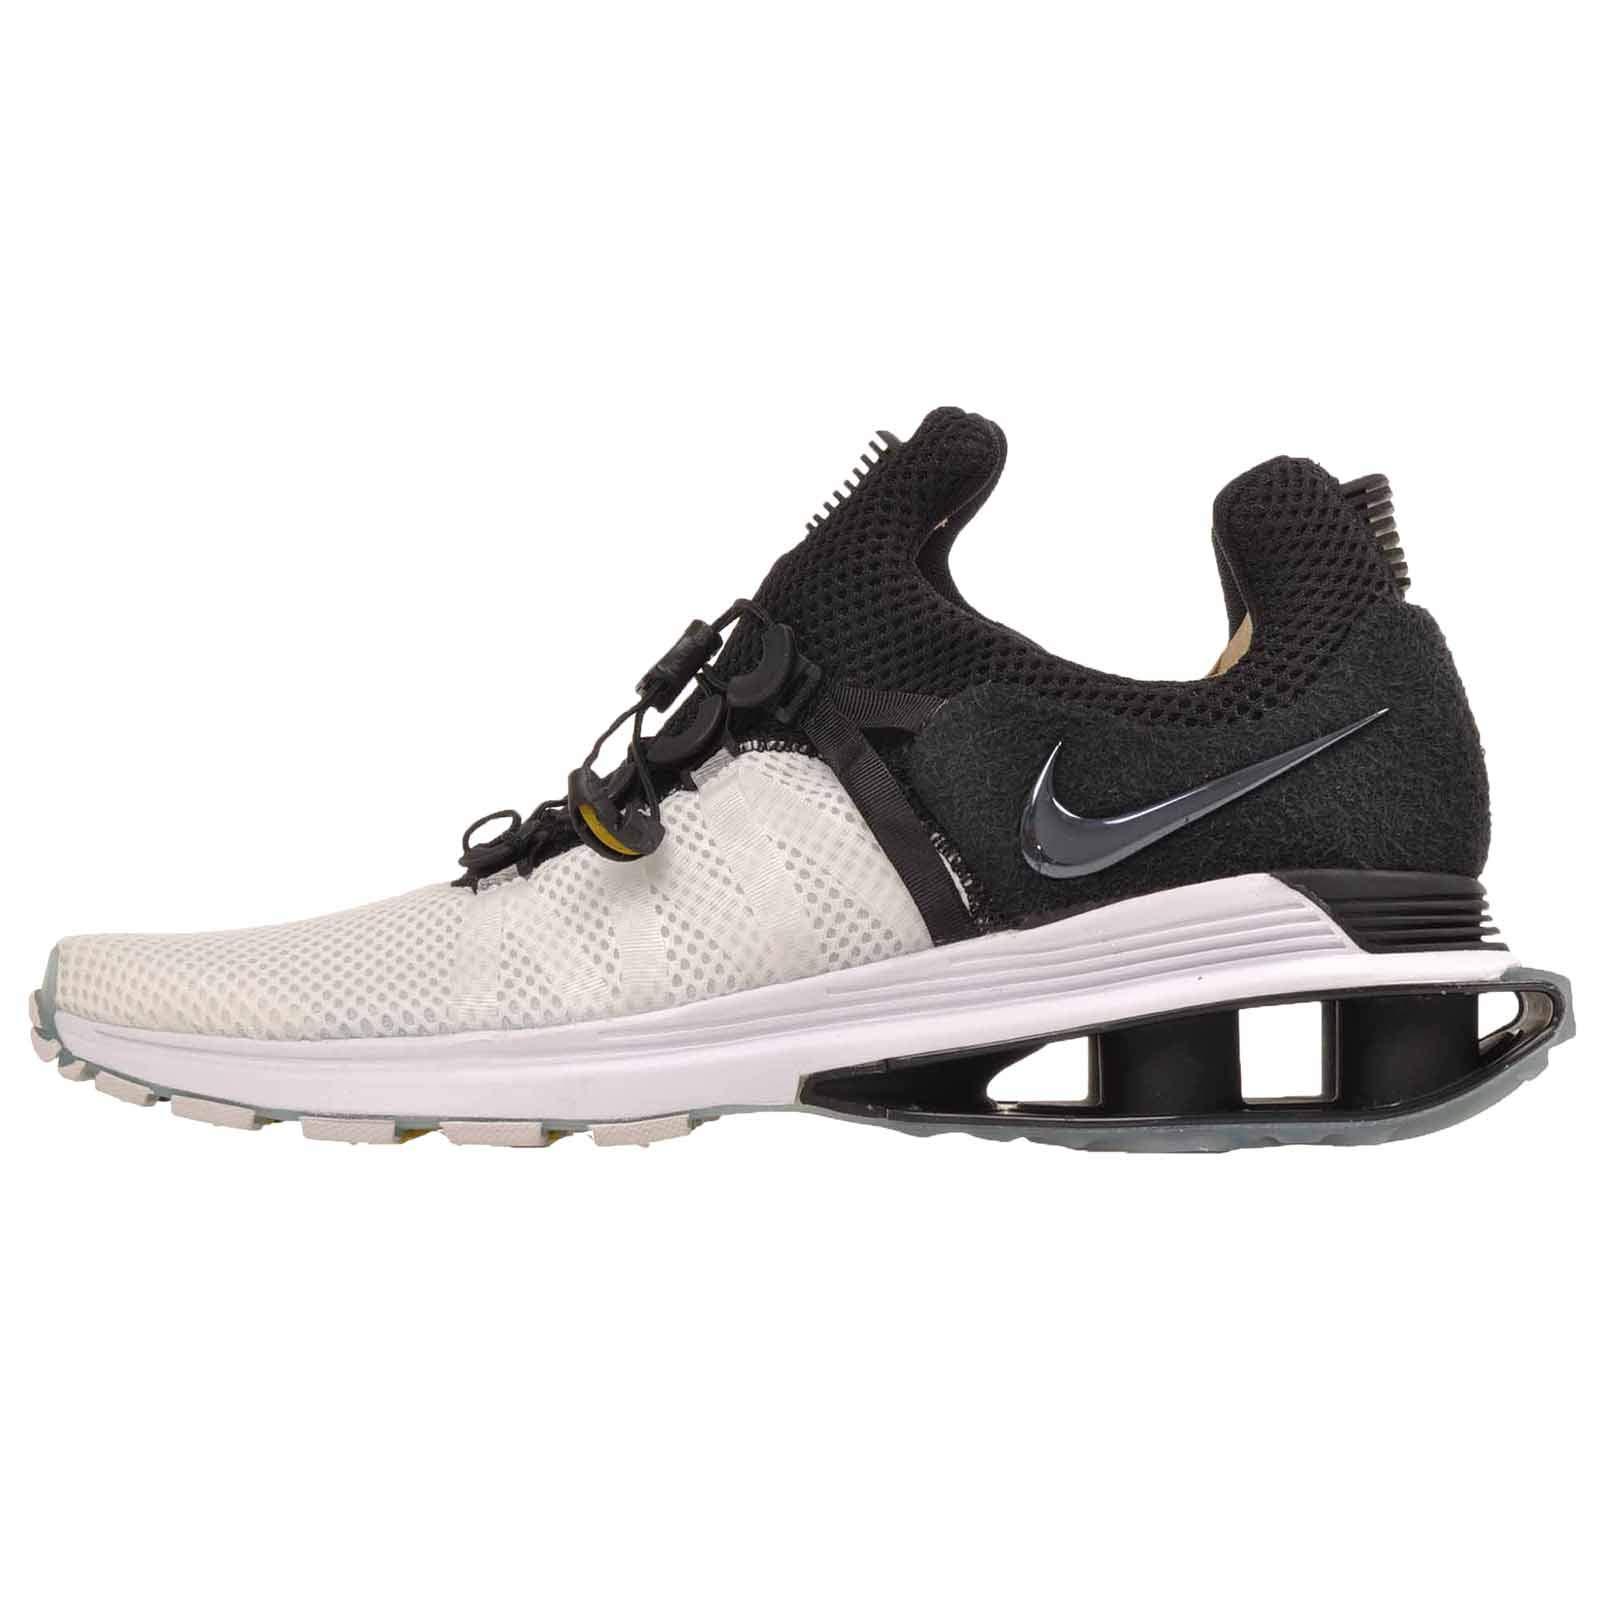 a7d2e6b868a Galleon - NIKE Men s Shox Gravity White Black White Nylon Running Shoes 8.5  (D) M US